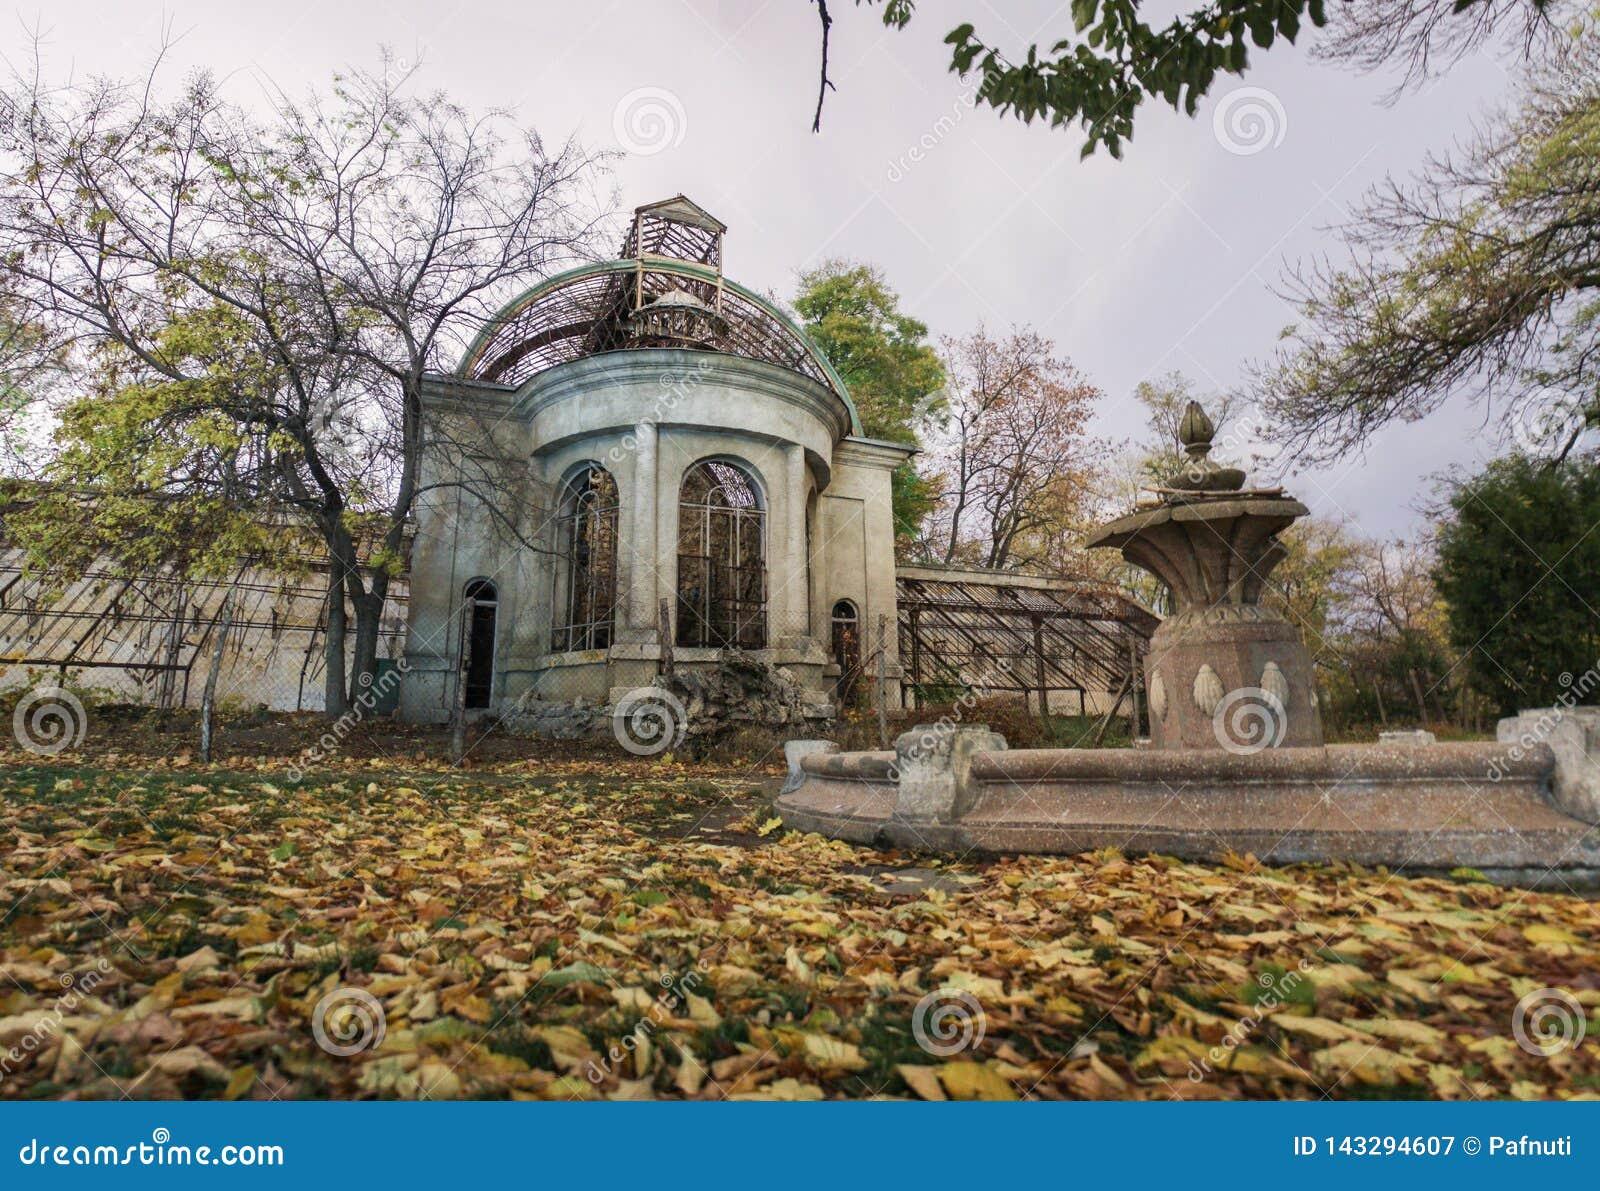 Old abandoned haunted house. Fallen foliage